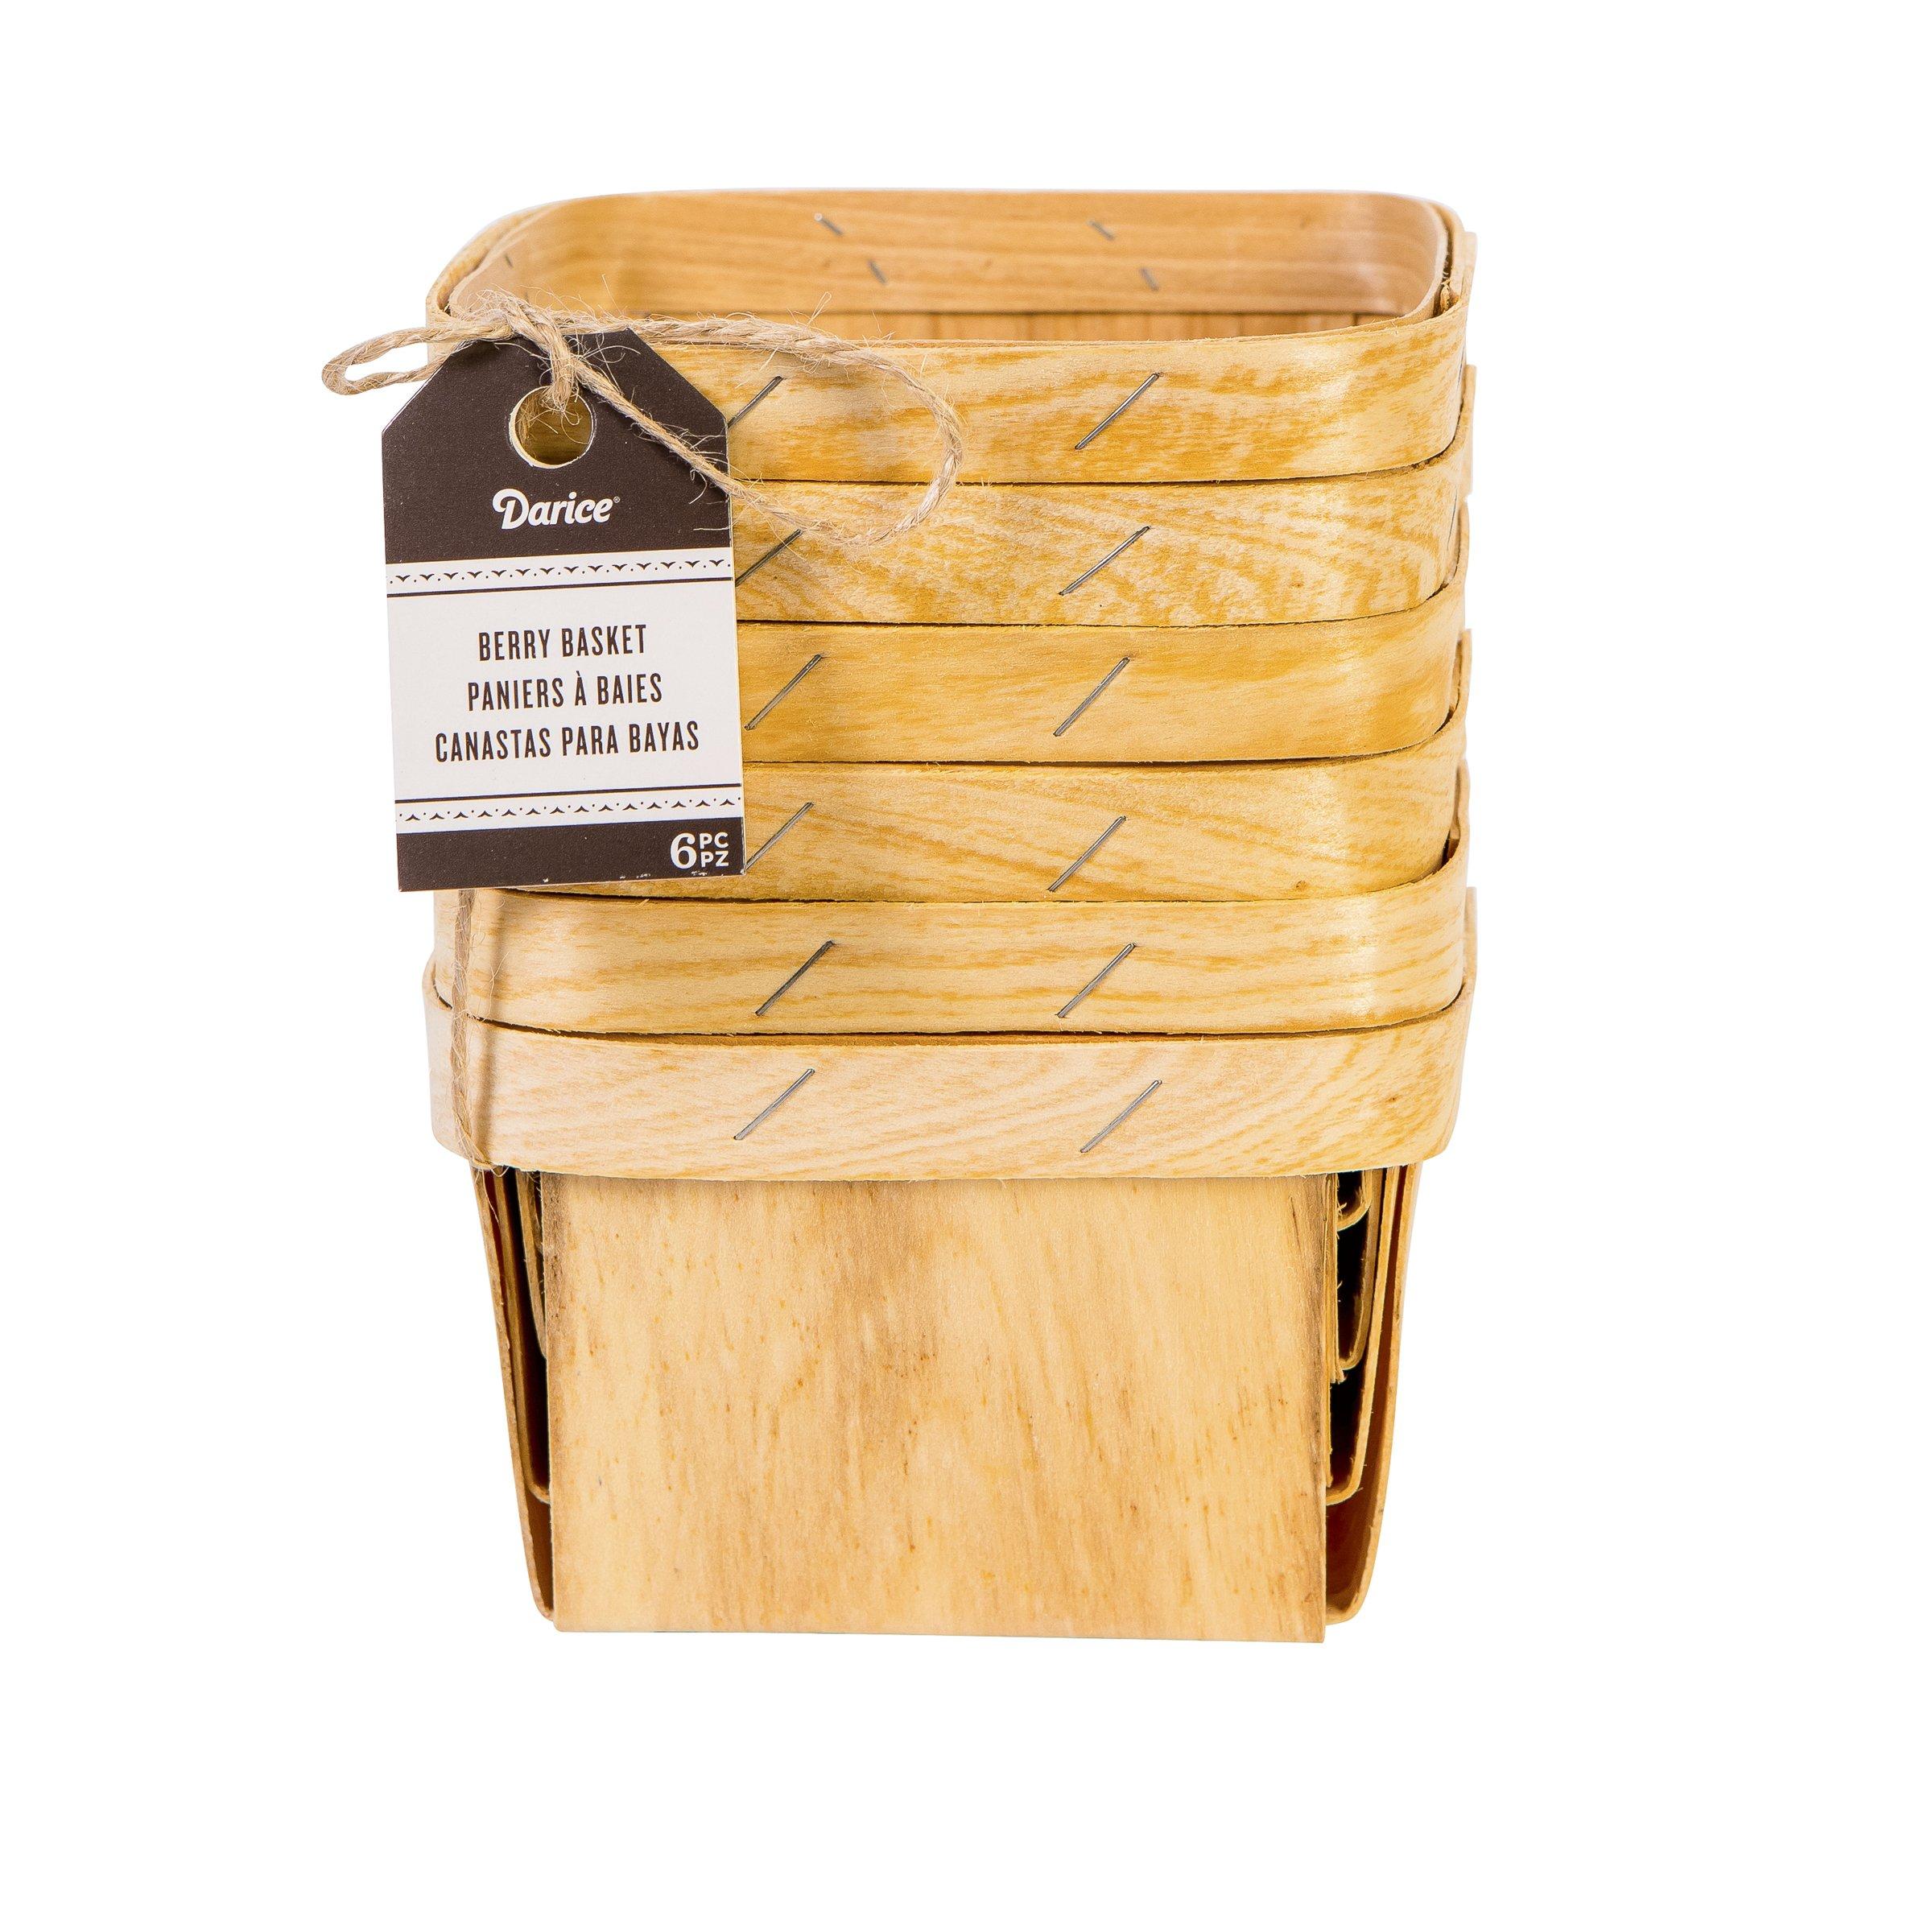 Darice Natural Wood Berry Basket, 6 Piece